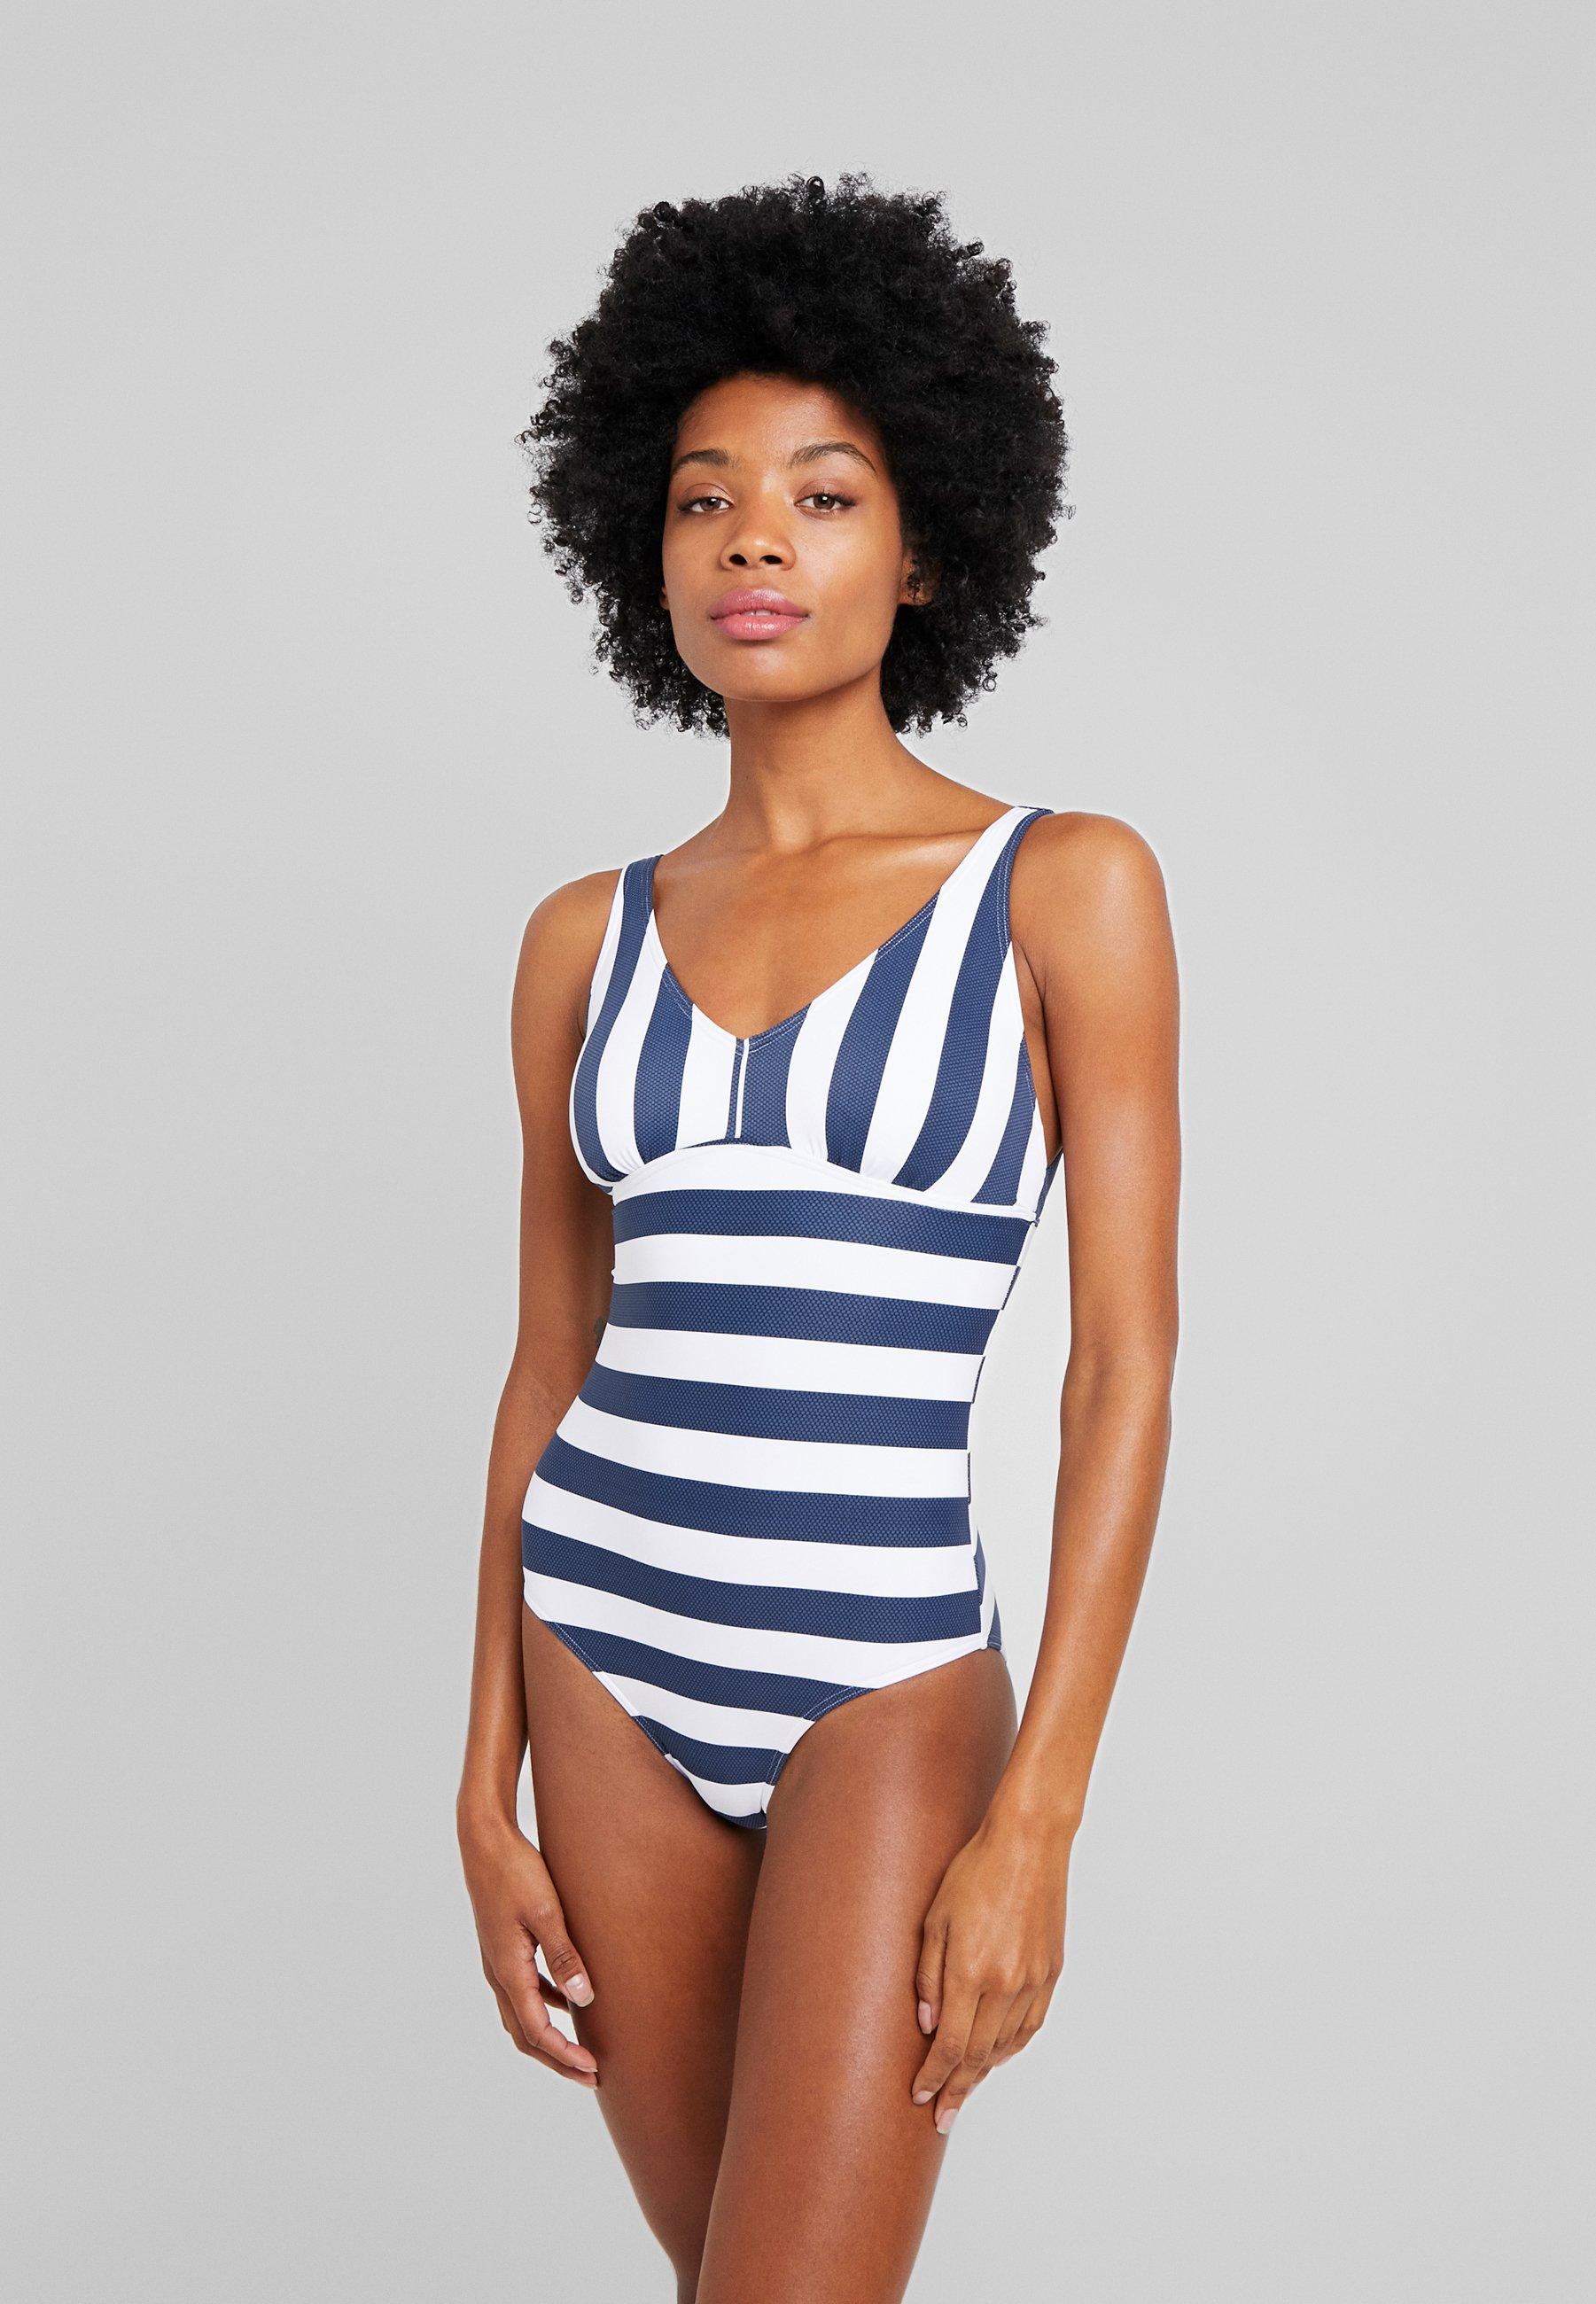 PaddedCostume North Beach Bagno Blue Dark Da Esprit Swimsuit iTwPuOZkX